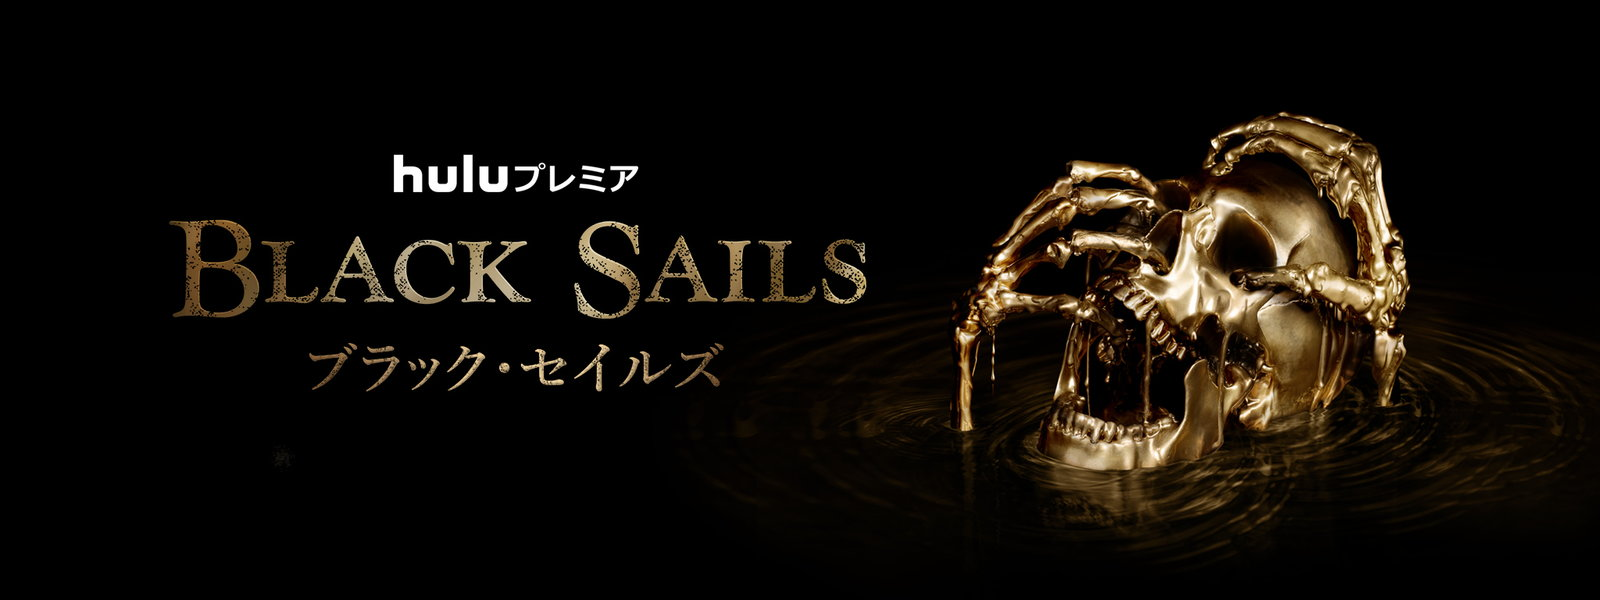 Black Sails/ブラック・セイルズ シーズン3 動画